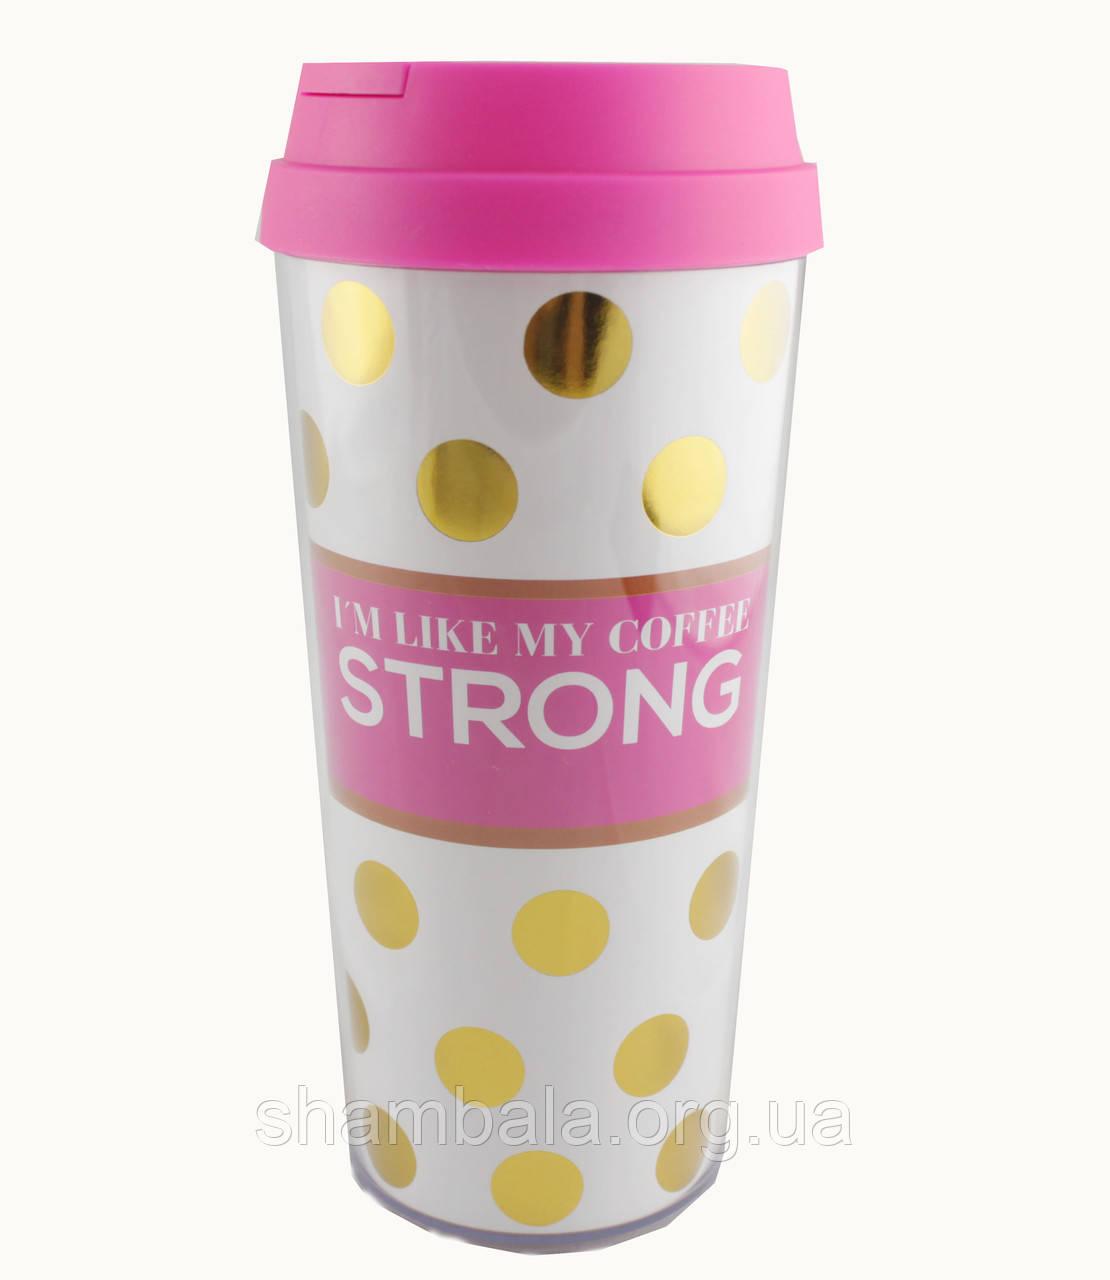 Термостакан для напитков My coffee STRONG (084848)